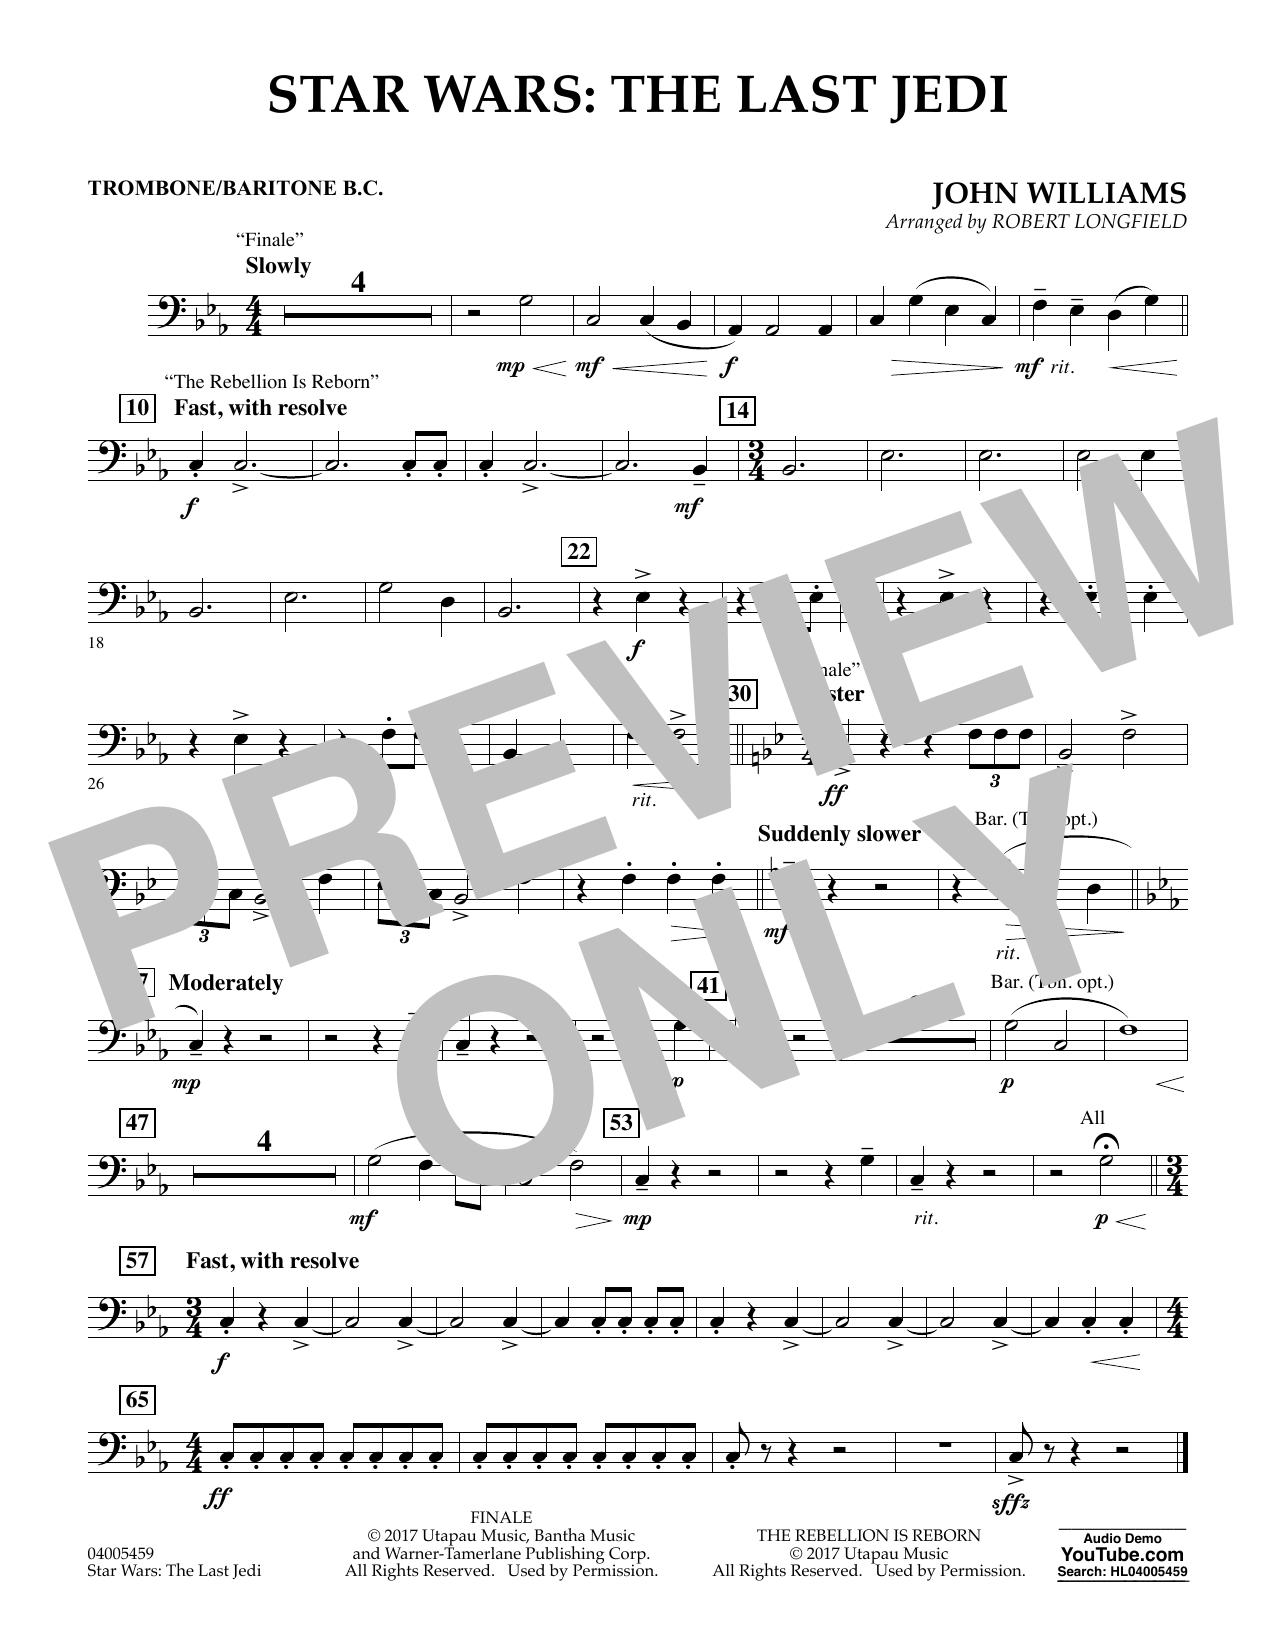 Star Wars: The Last Jedi - Trombone/Baritone B.C. (Concert Band)